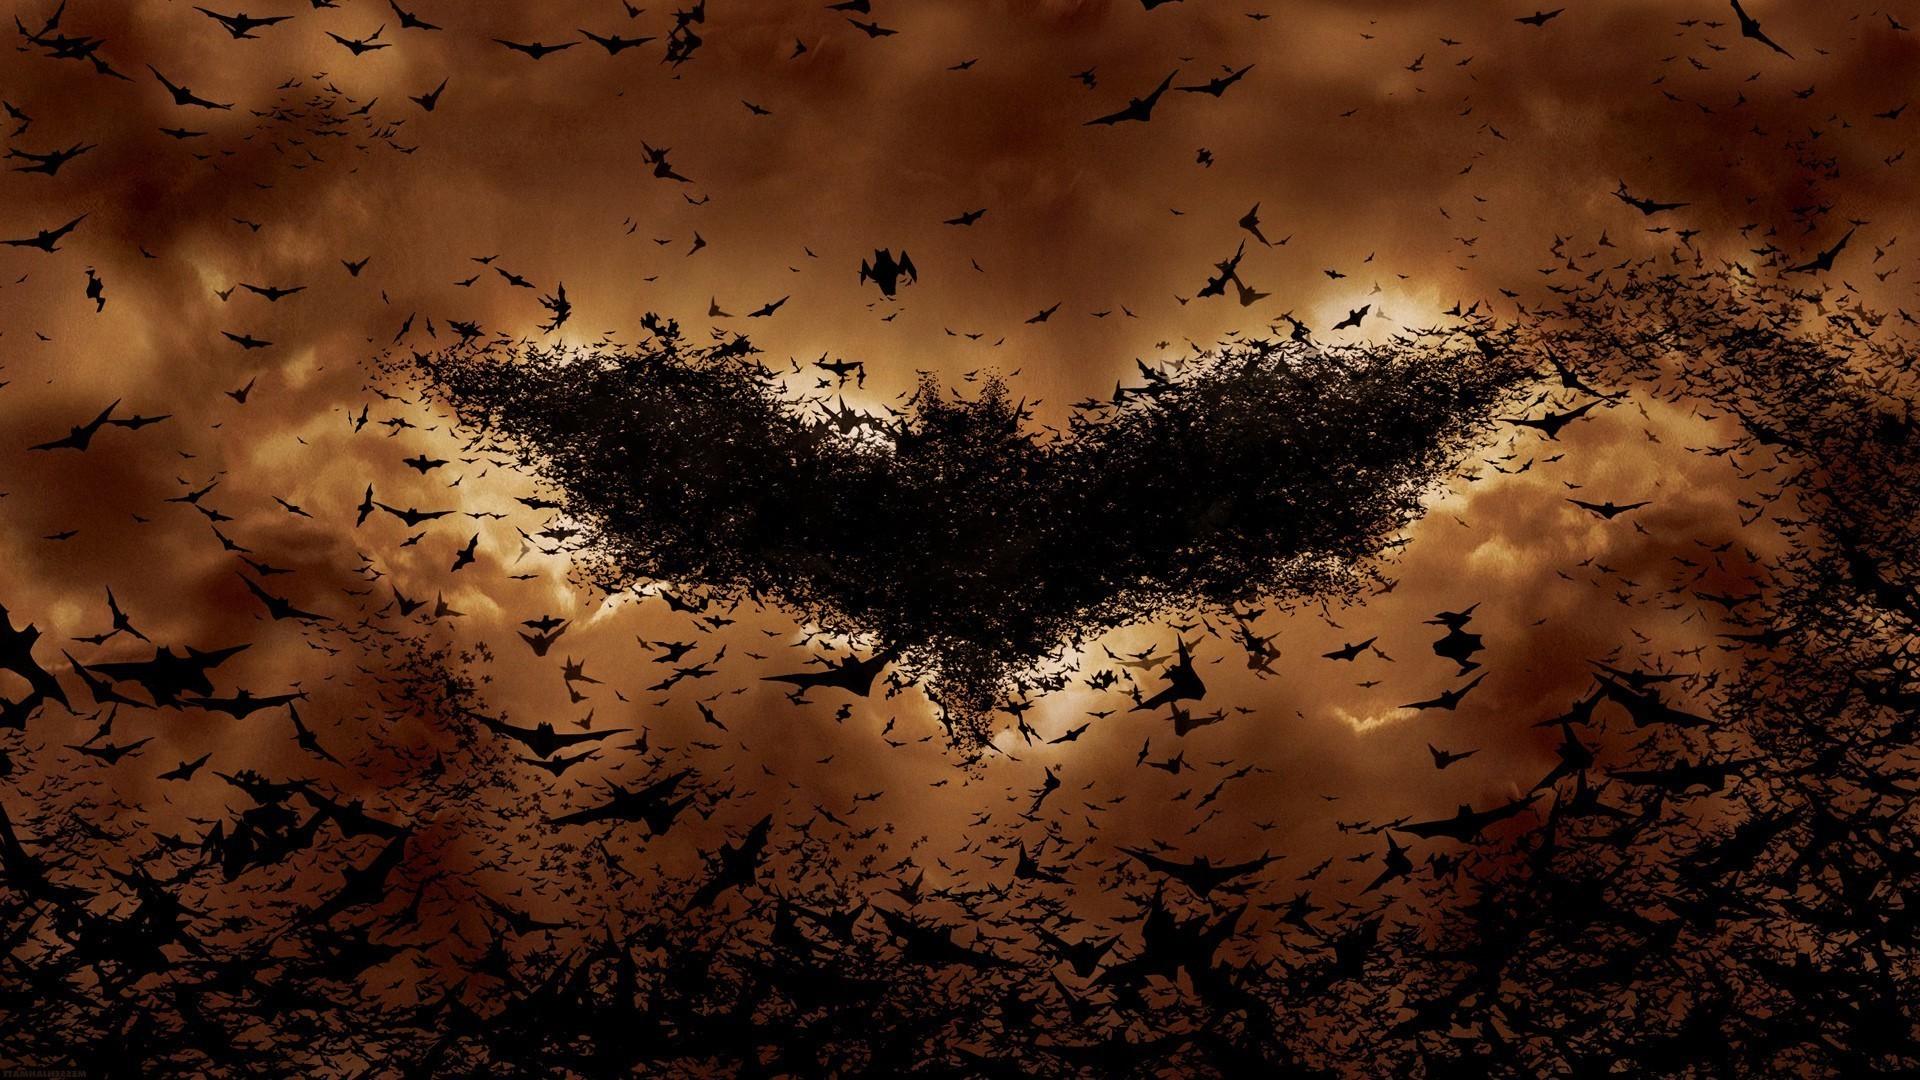 Batman, Bats, Movies, Batman Logo Wallpapers HD / Desktop and Mobile  Backgrounds